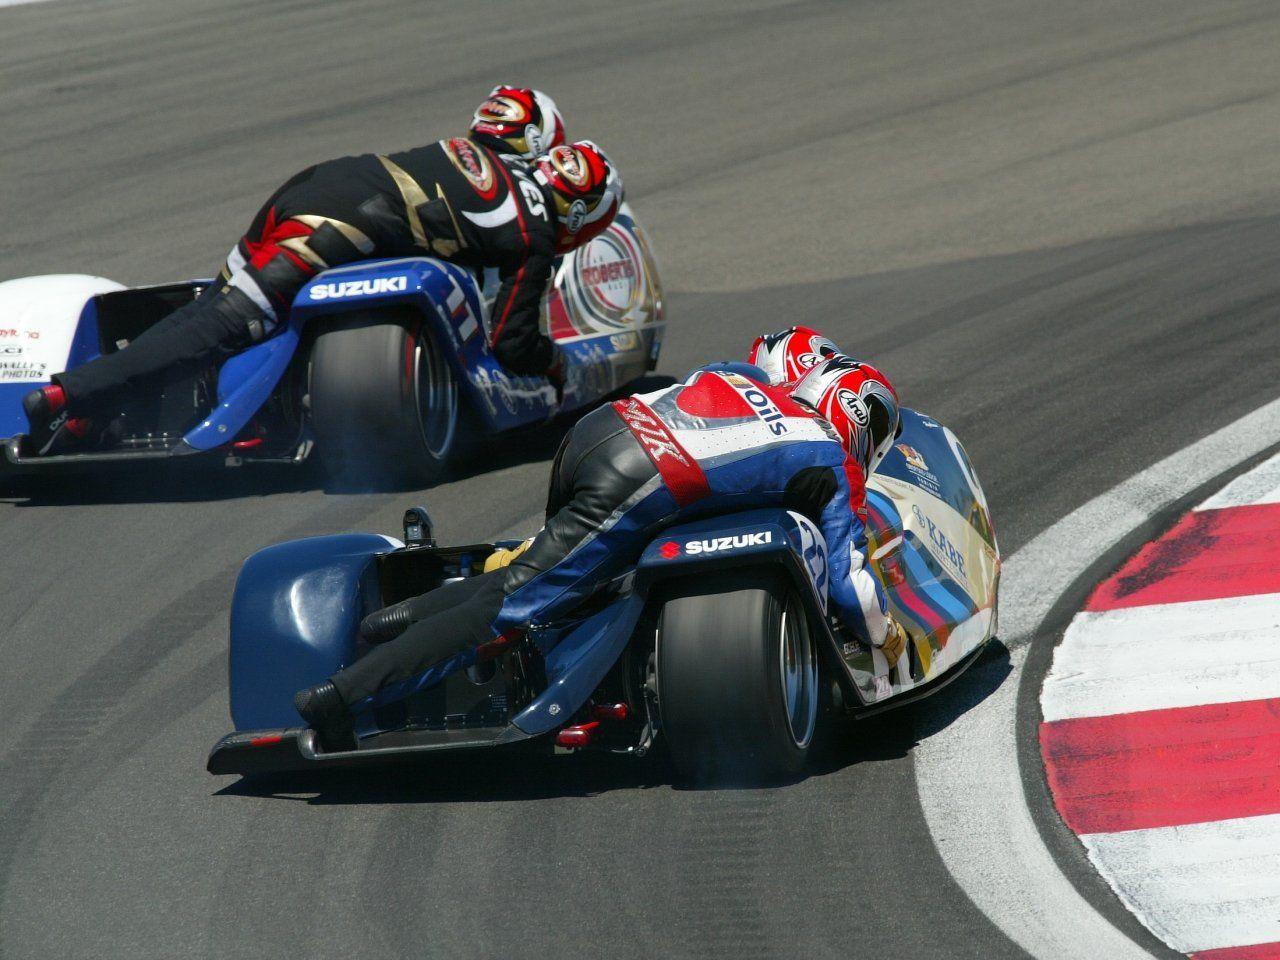 Motorcycle Racing Sidecar With Images Racing Racing Bikes